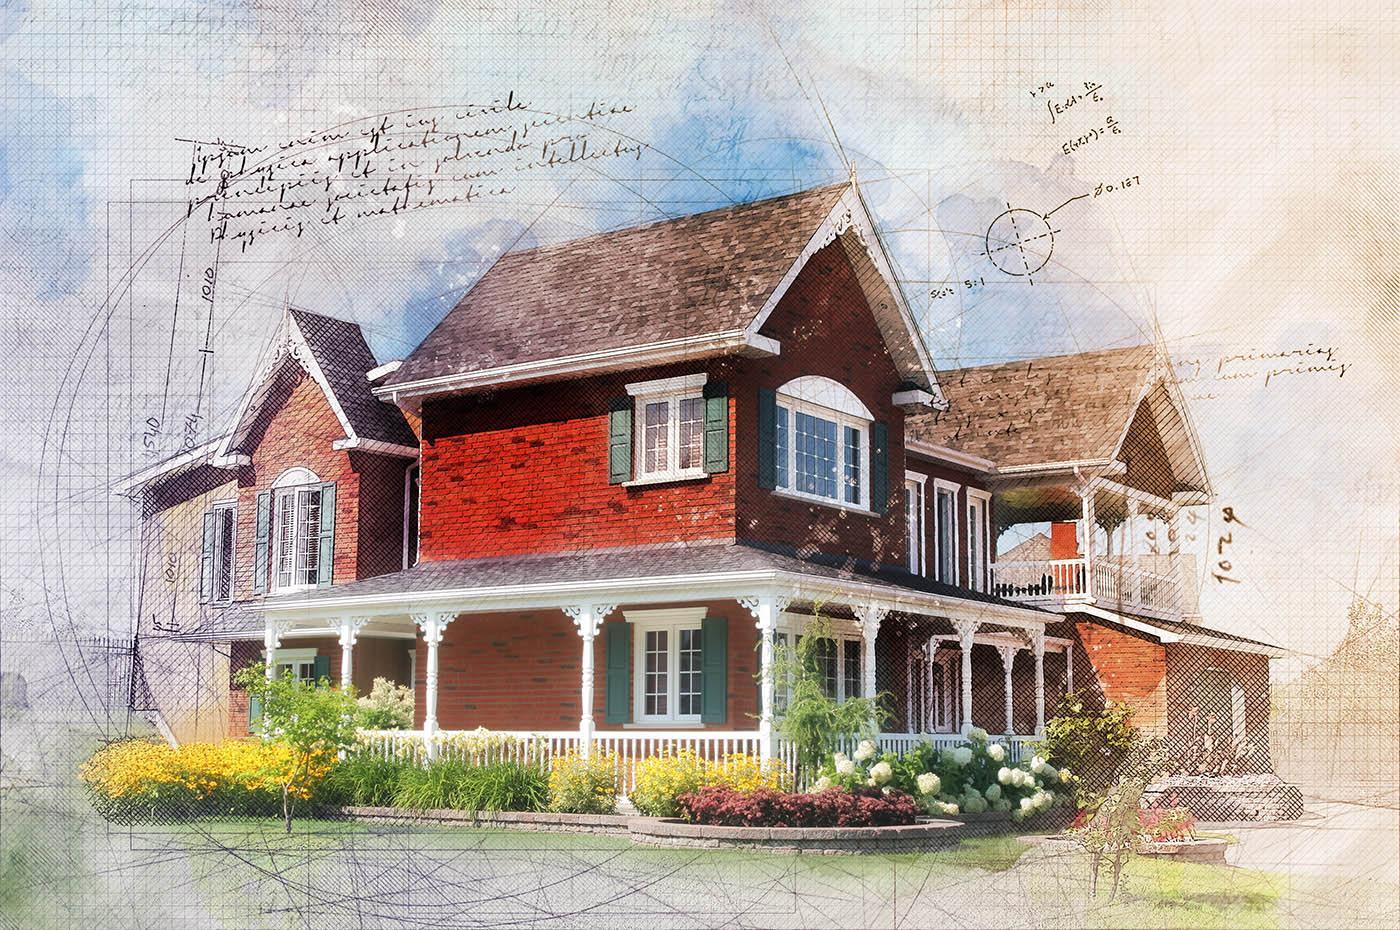 Beautiful Cottage Sketch Image